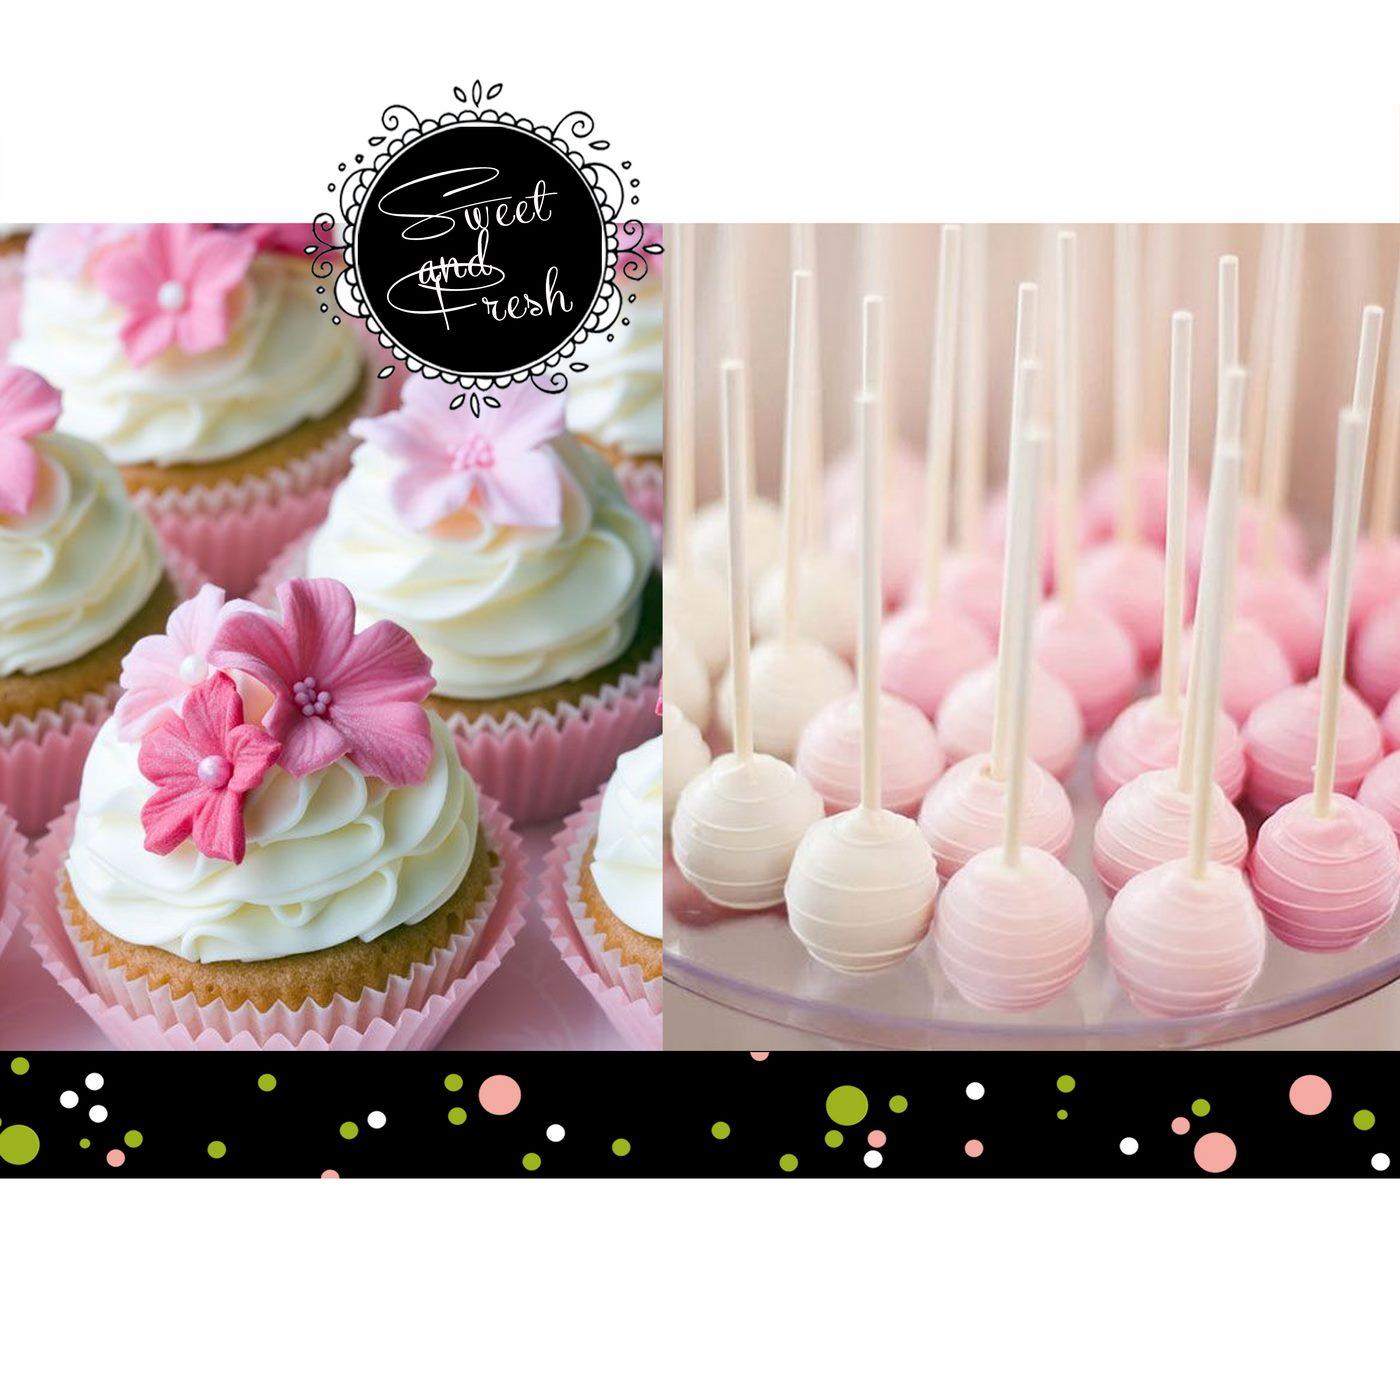 Cakepops in Rosa unf Cupcakes mit Blumen